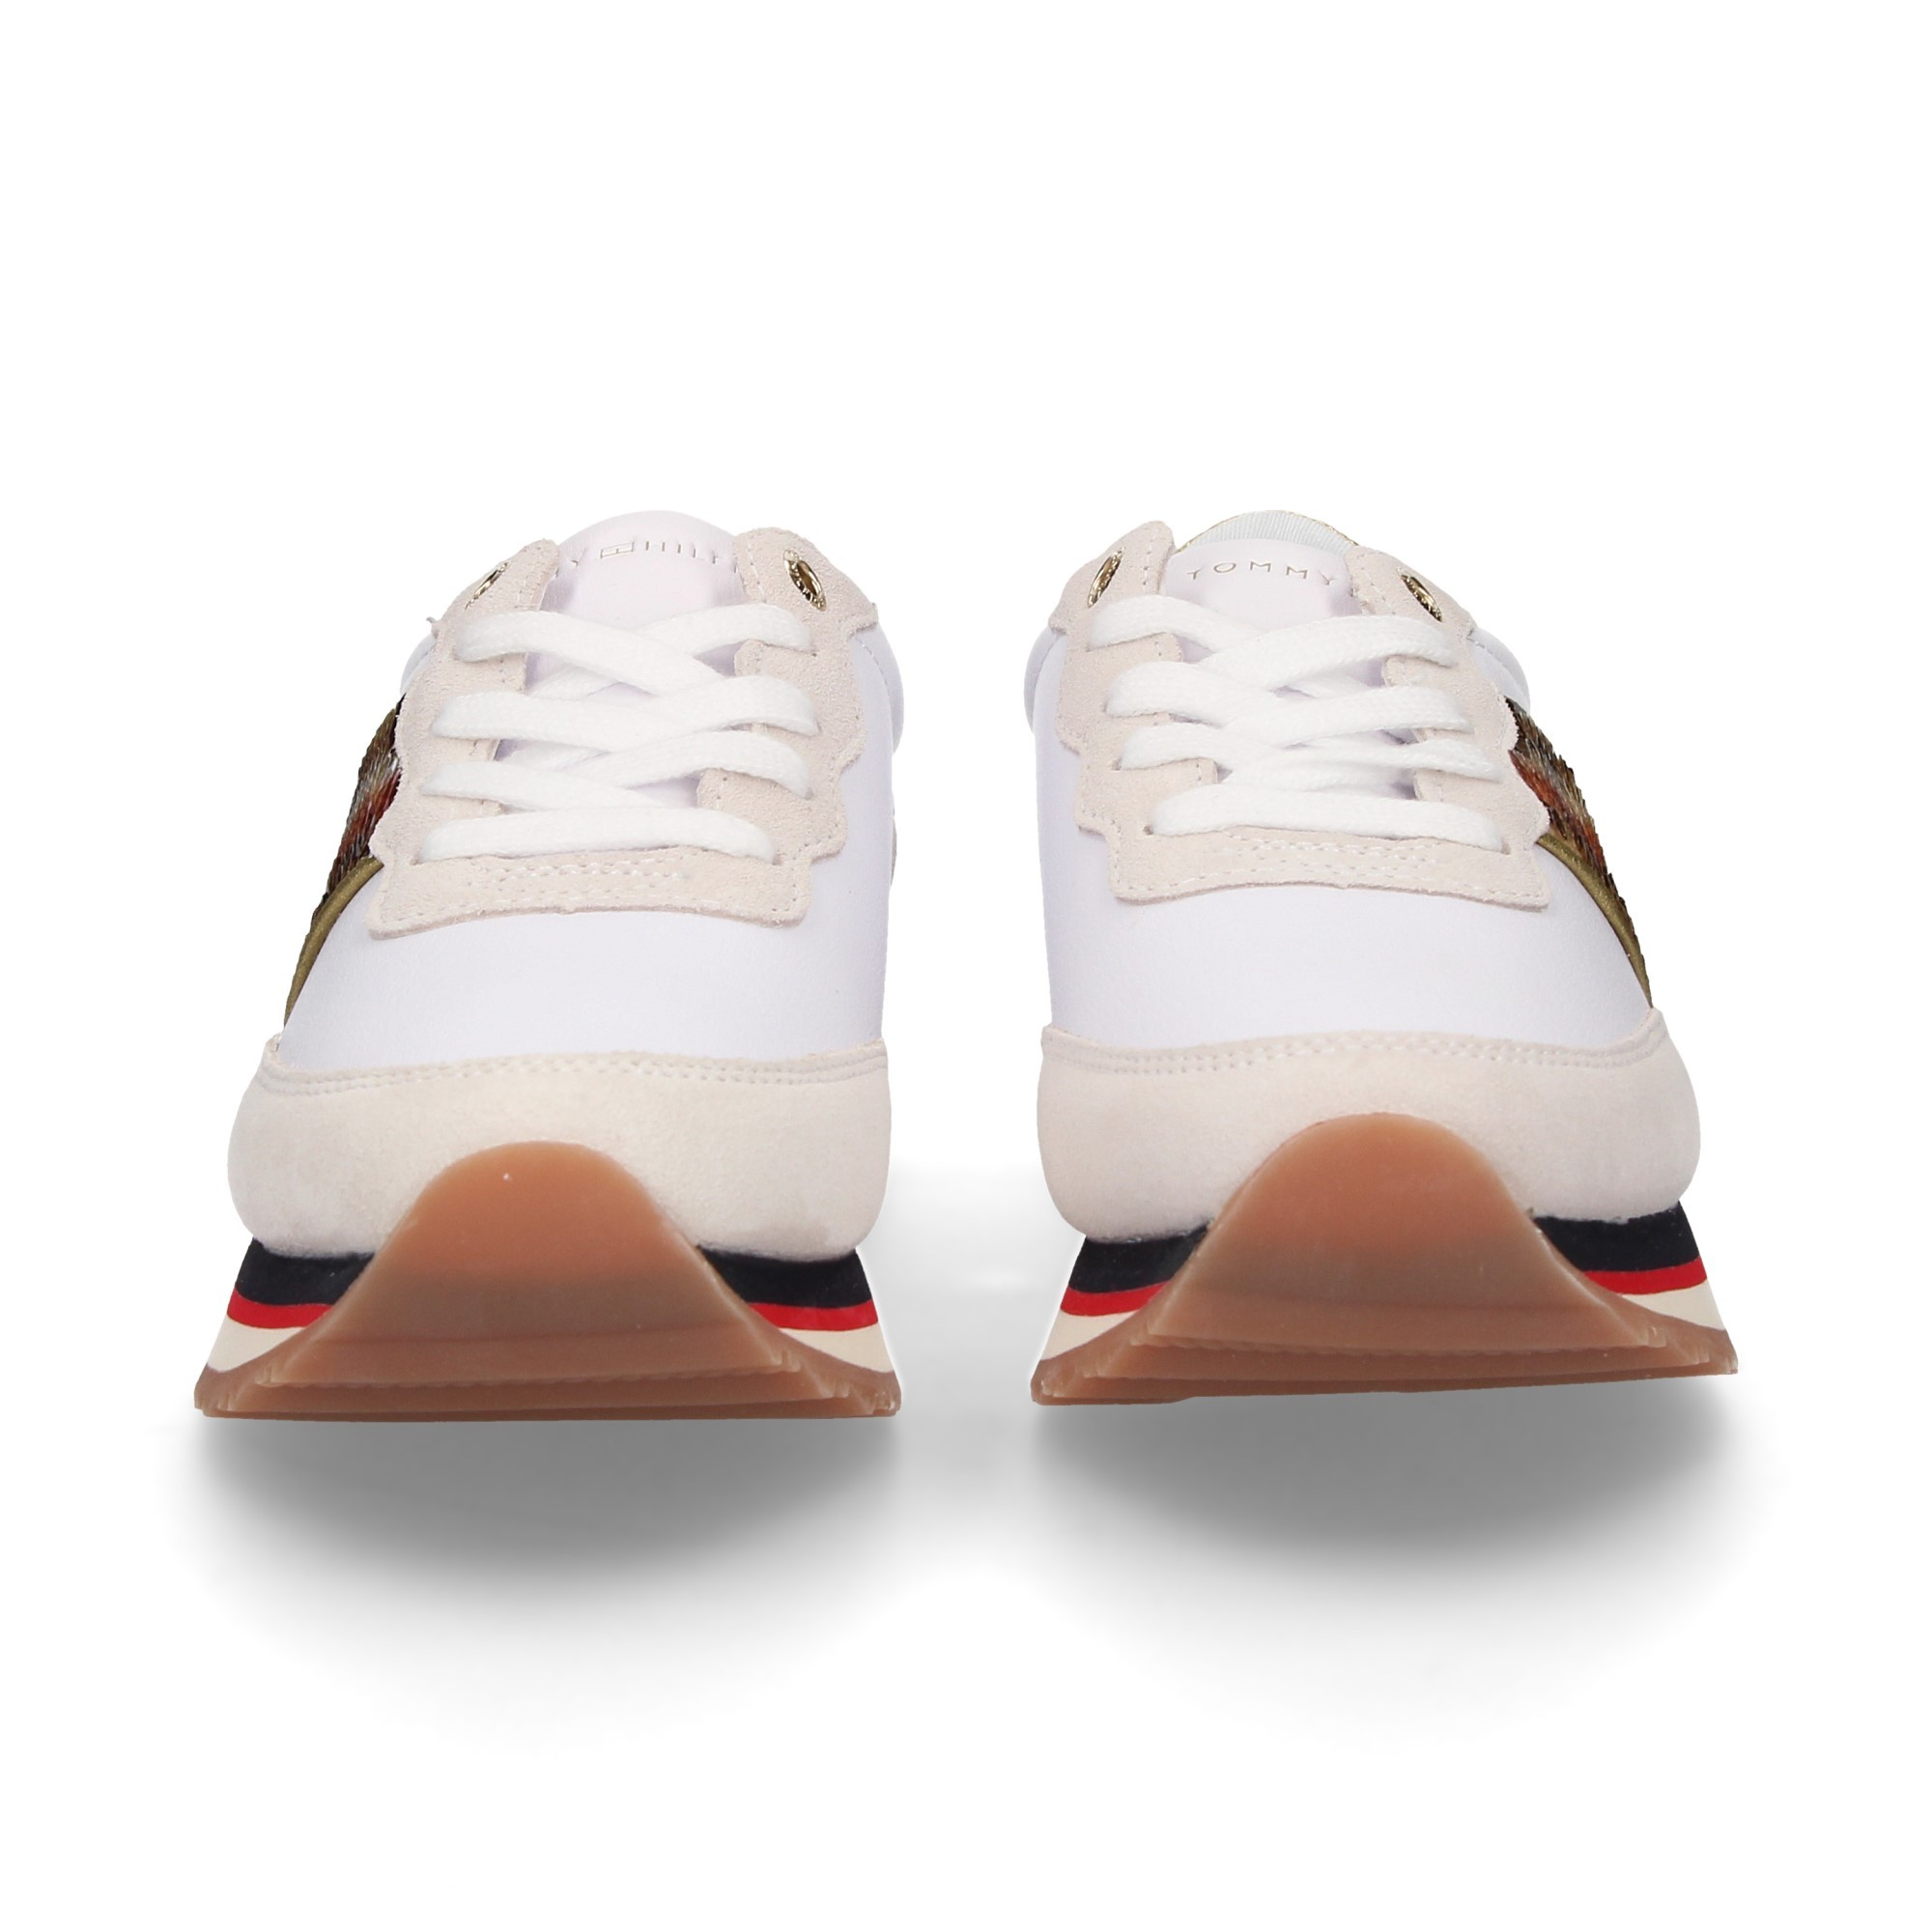 deportivo-banda-lentejuelas-blanco